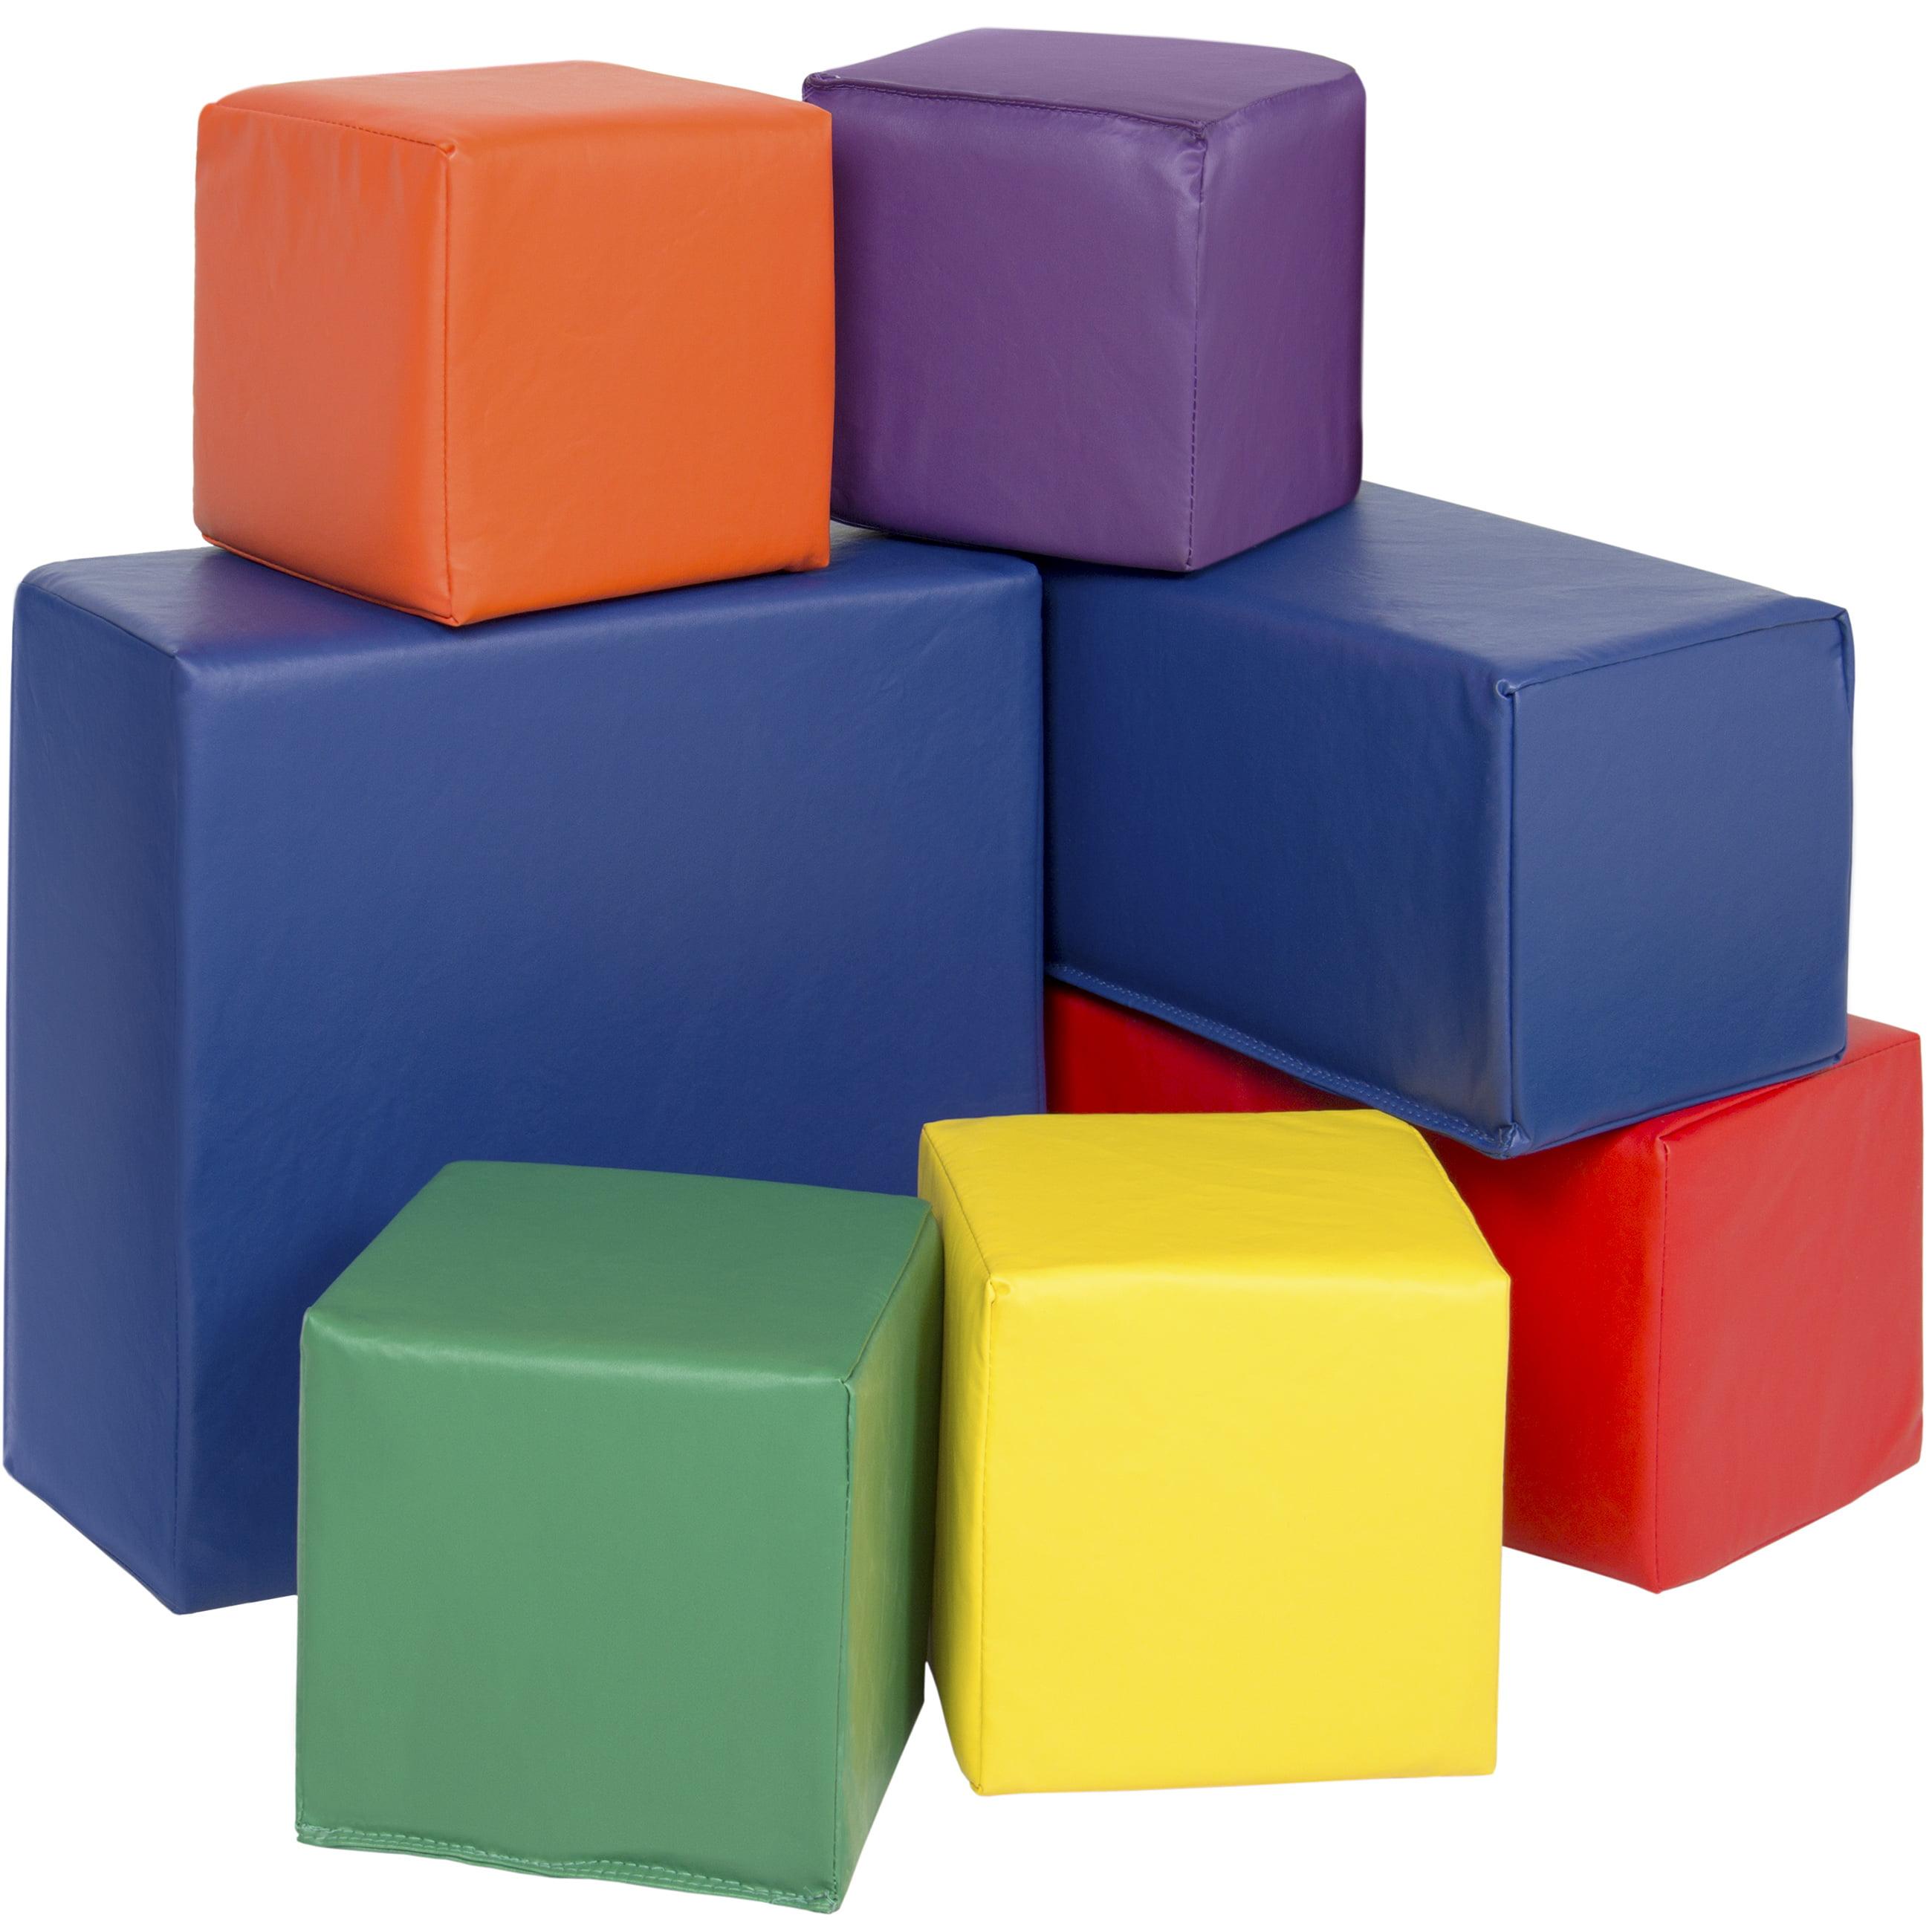 Best Choice Products 7-Piece Soft Big Foam Blocks Play Set for Sensory Development and Motor Skills - Multicolor